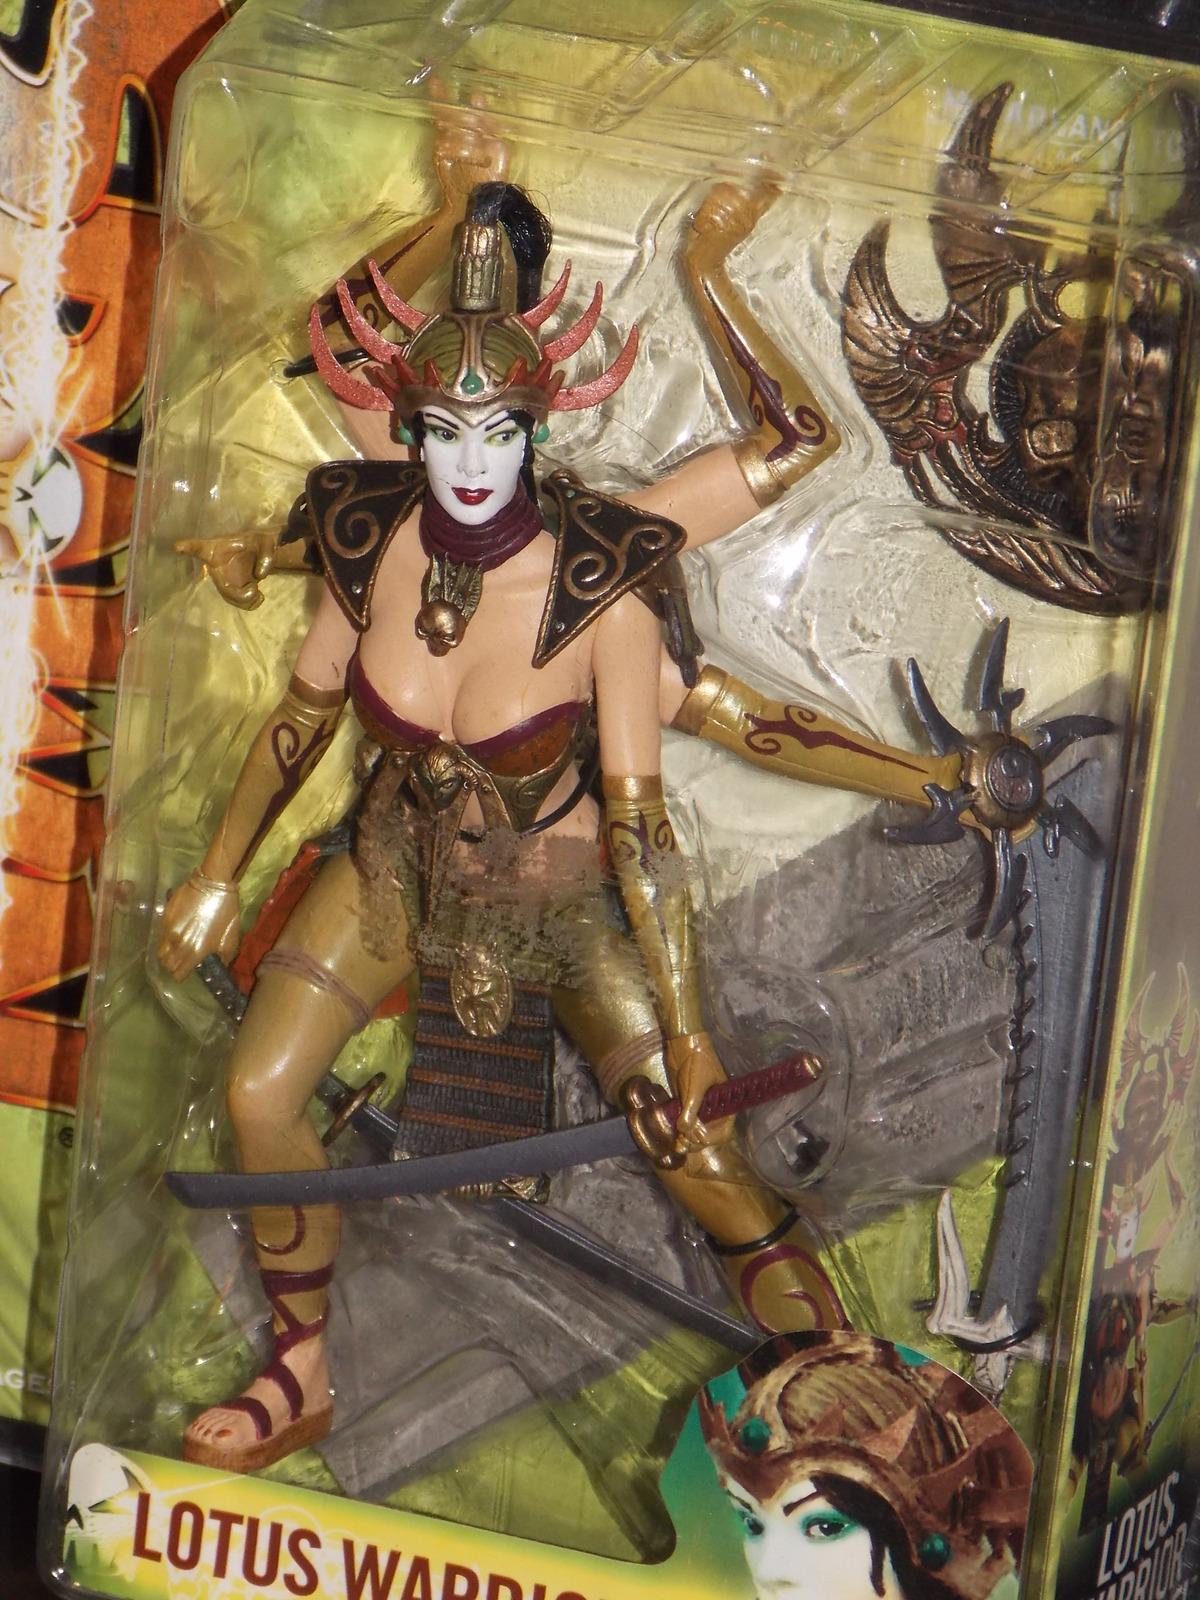 2005 McFarlane Spawn Regenerated Lotus Warrior Angel Figure New In The Package image 3